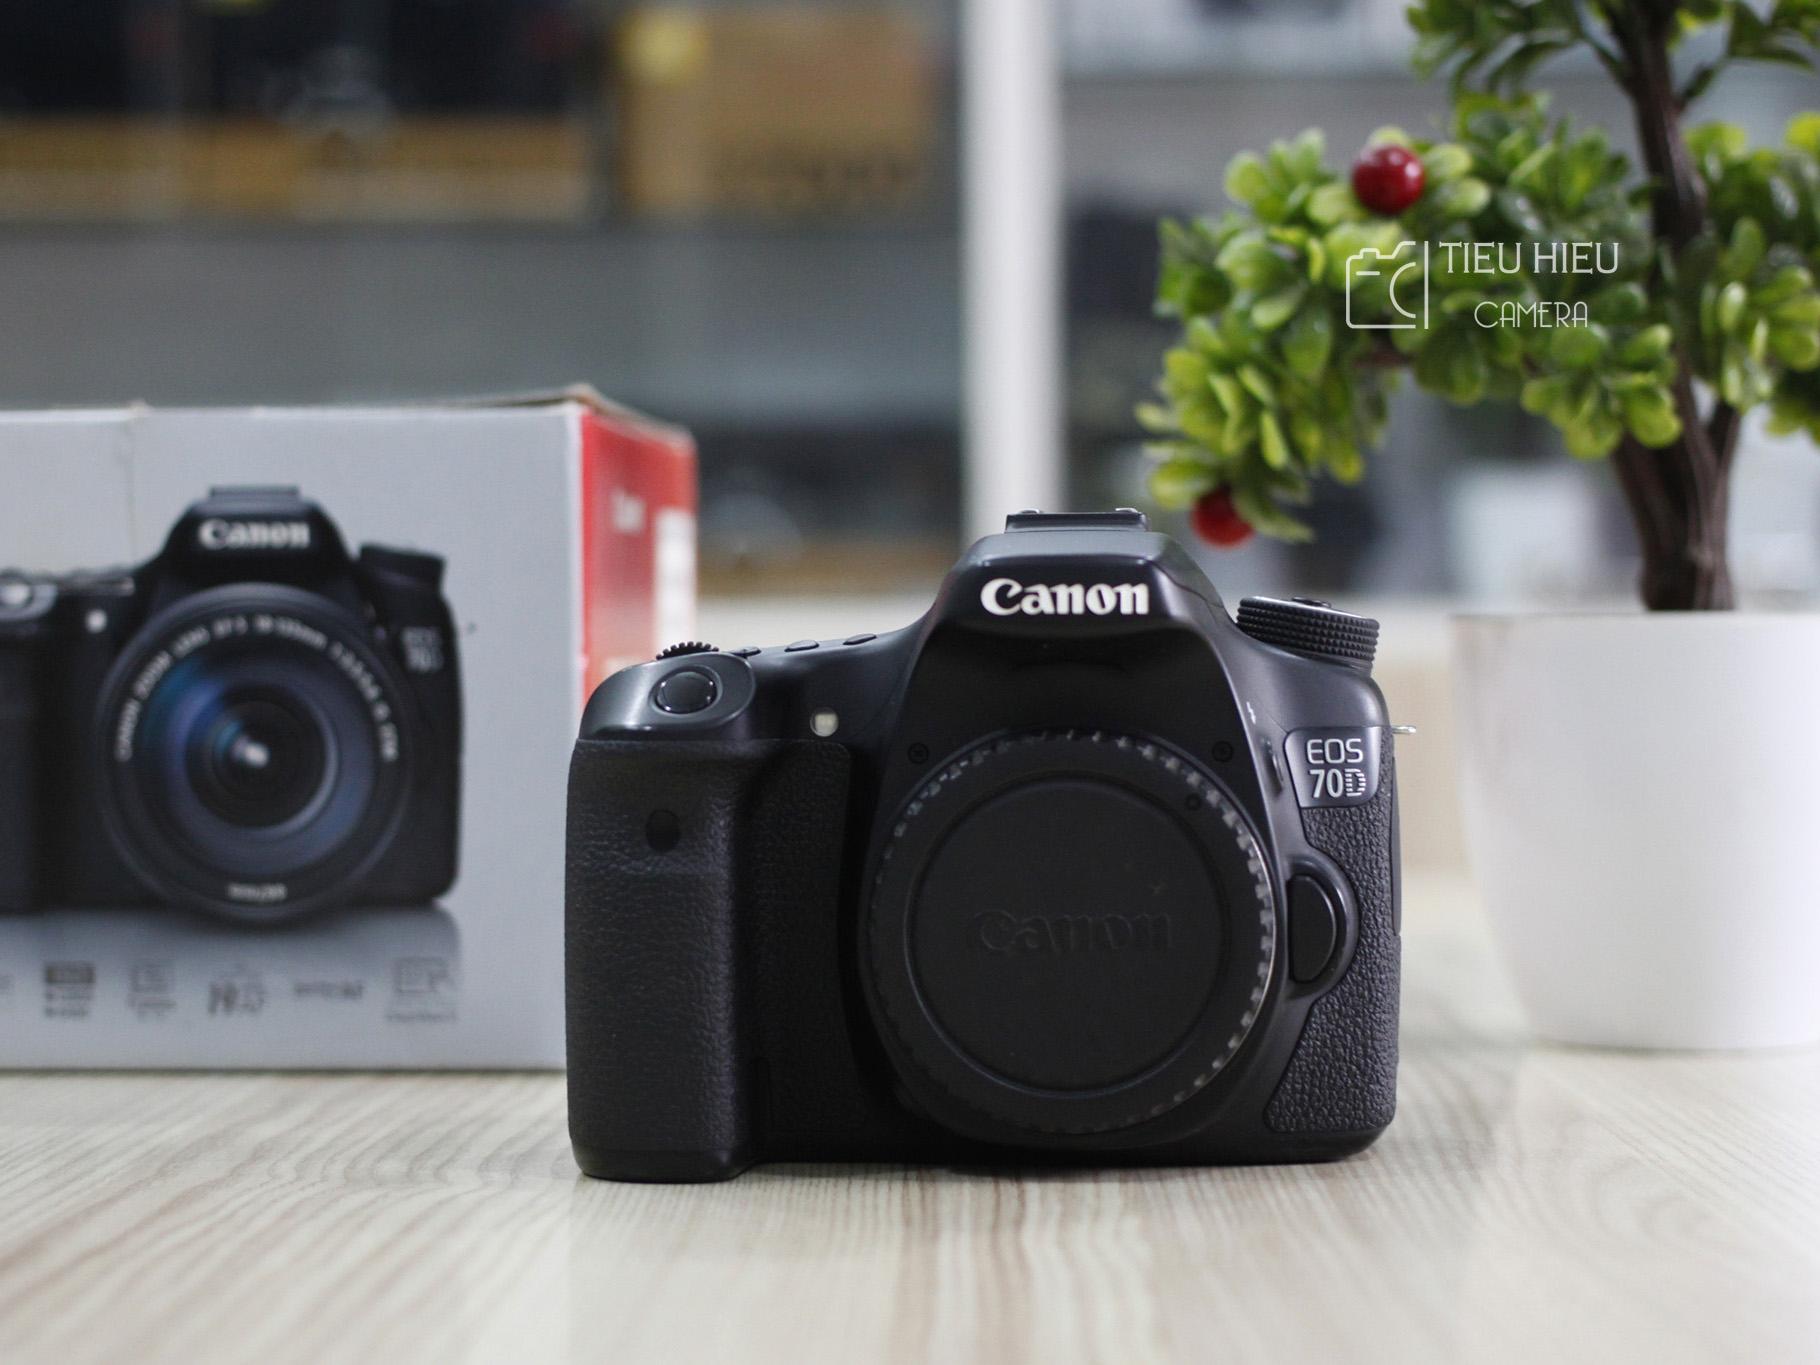 Body Canon 70D